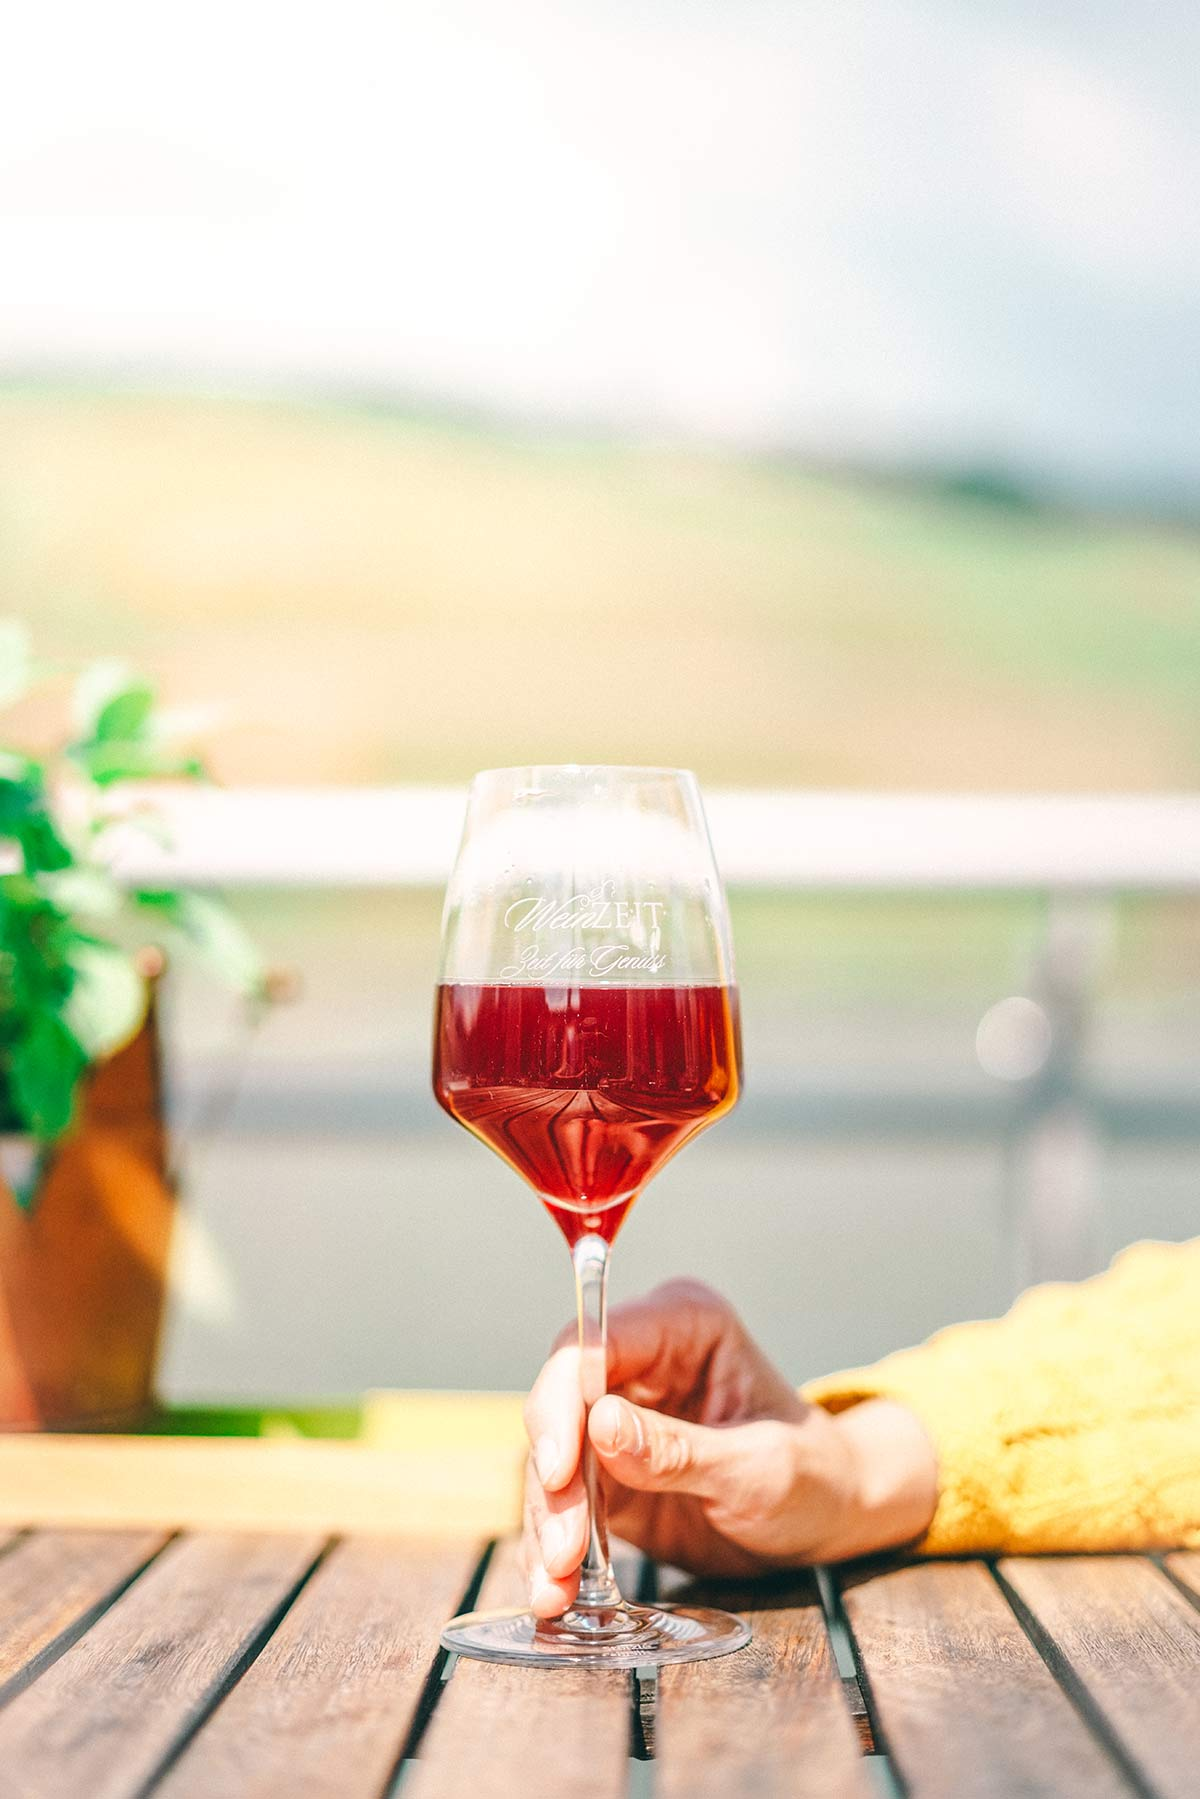 Wein trinken in Bingen